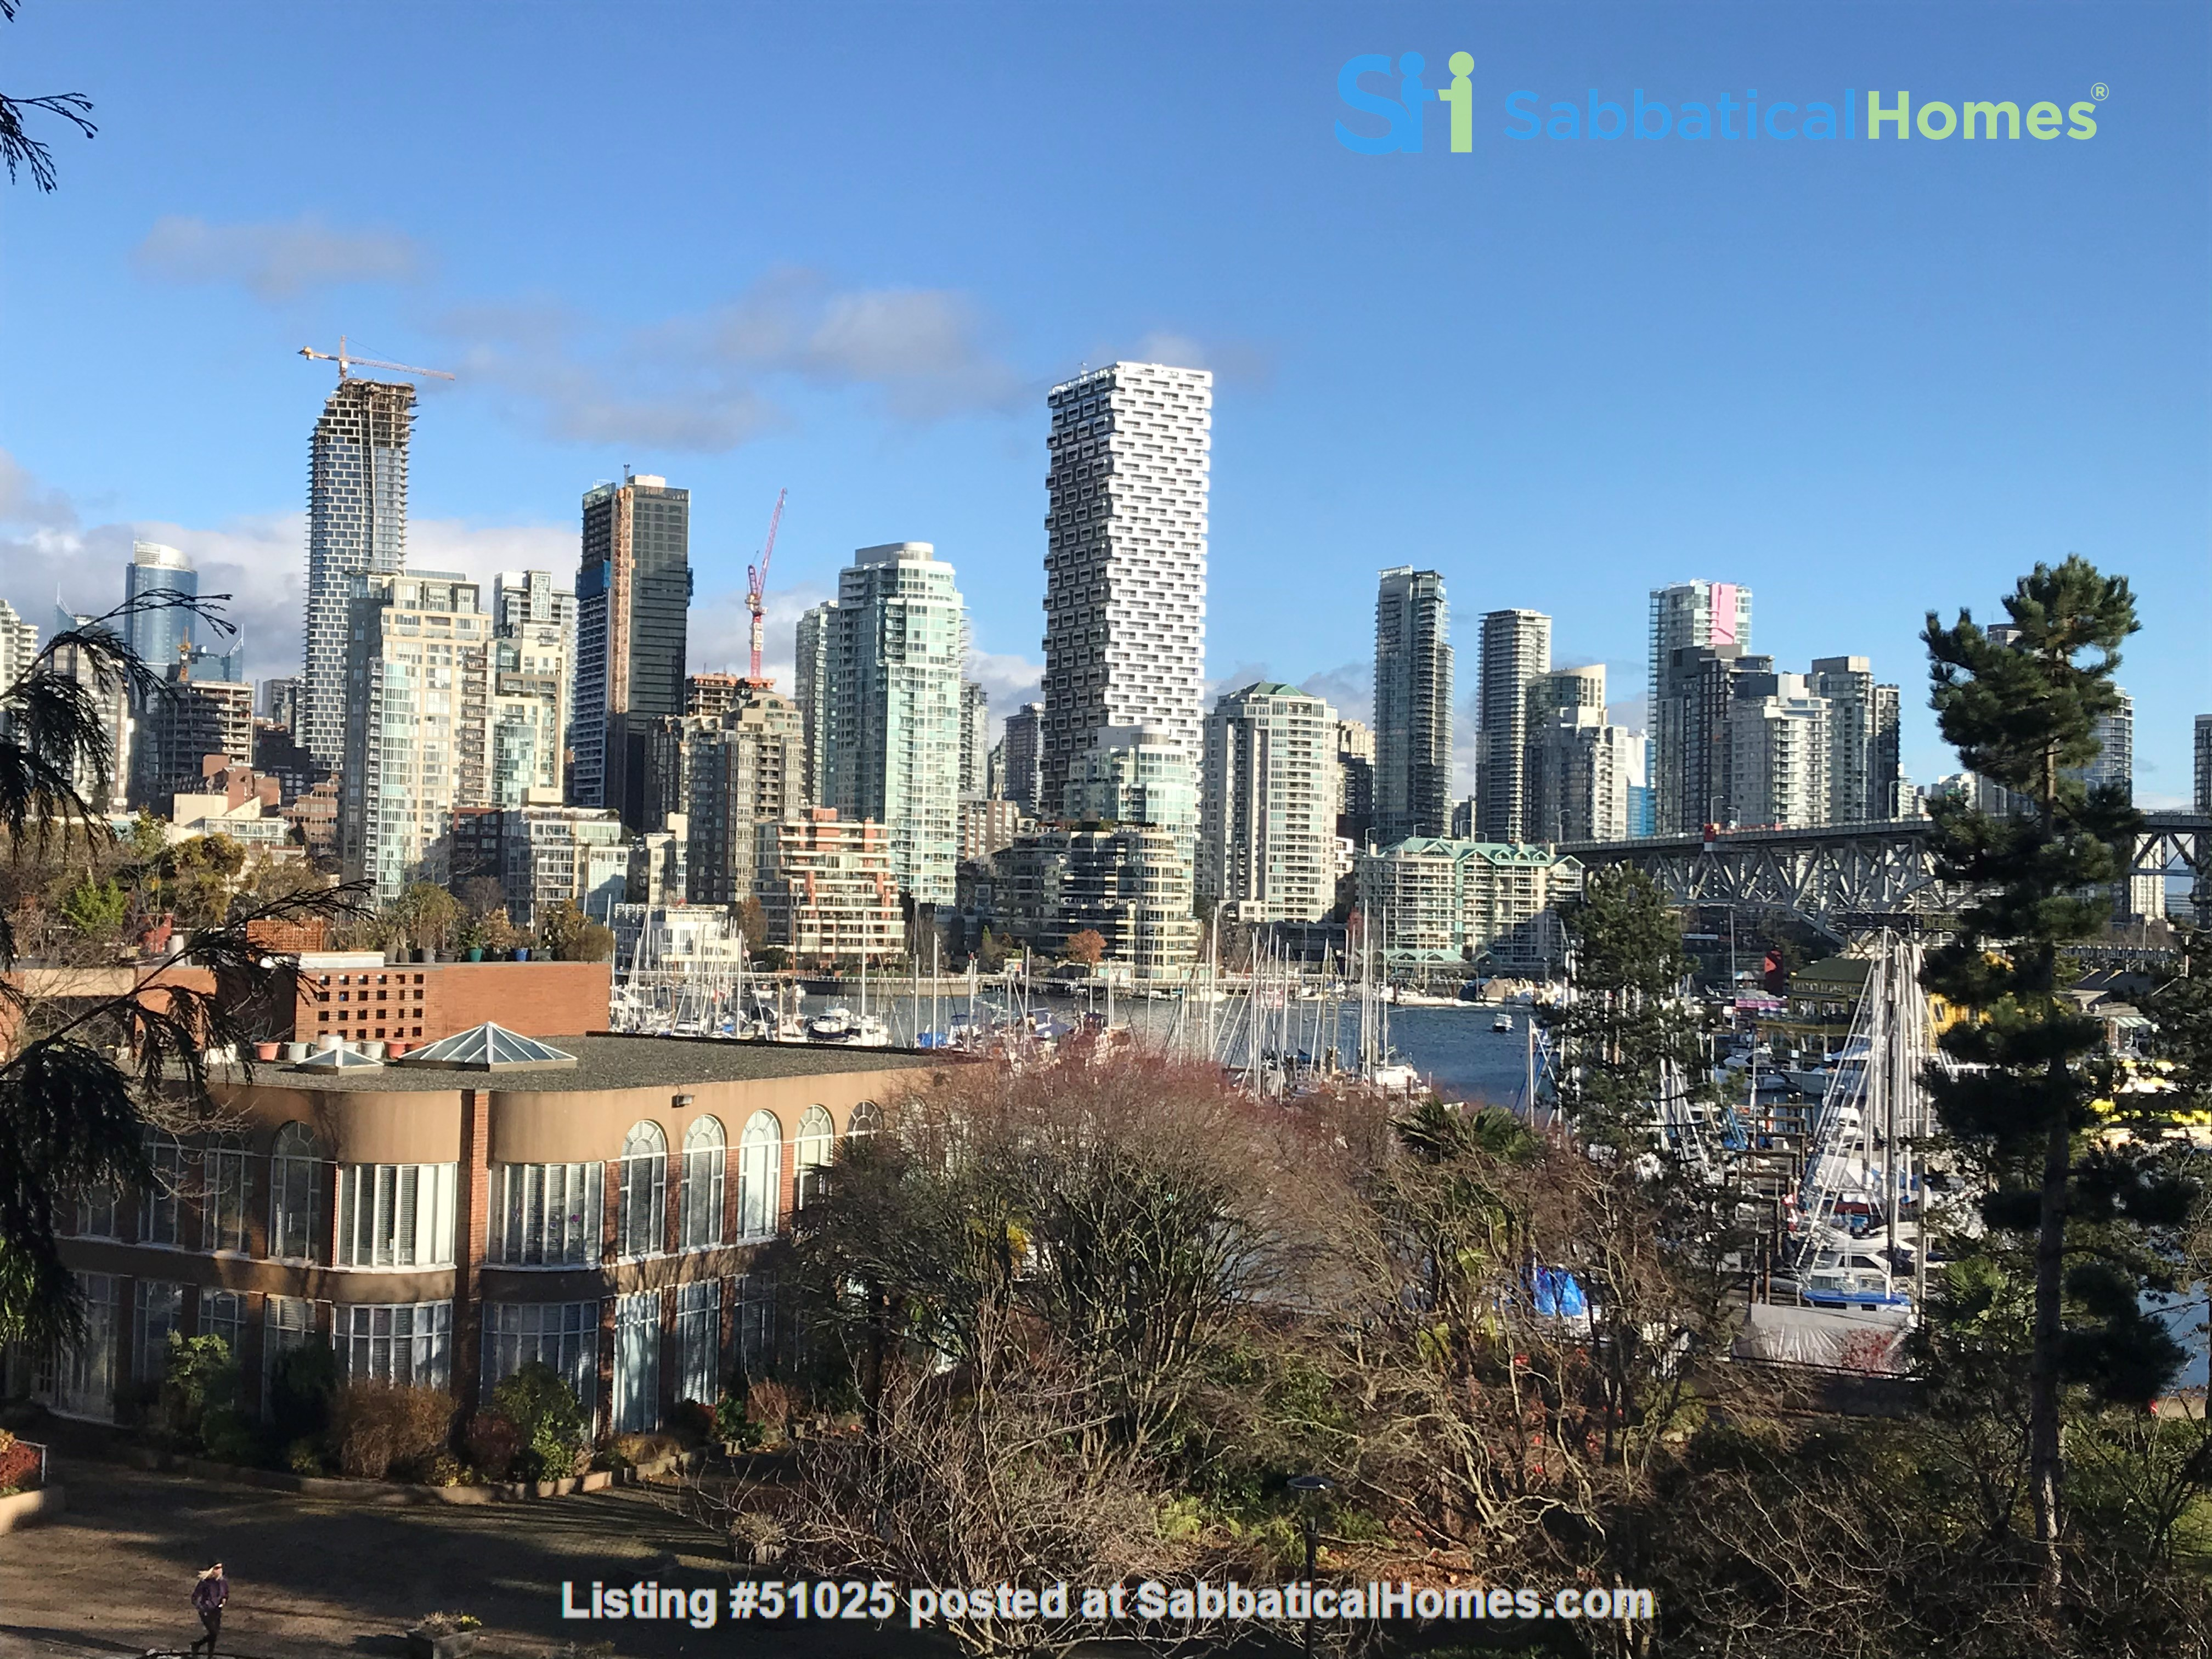 Vancouver  Seawall 2 Bedroom Condo by  Granville Island and Kitsilano Home Rental in Vancouver, British Columbia, Canada 0